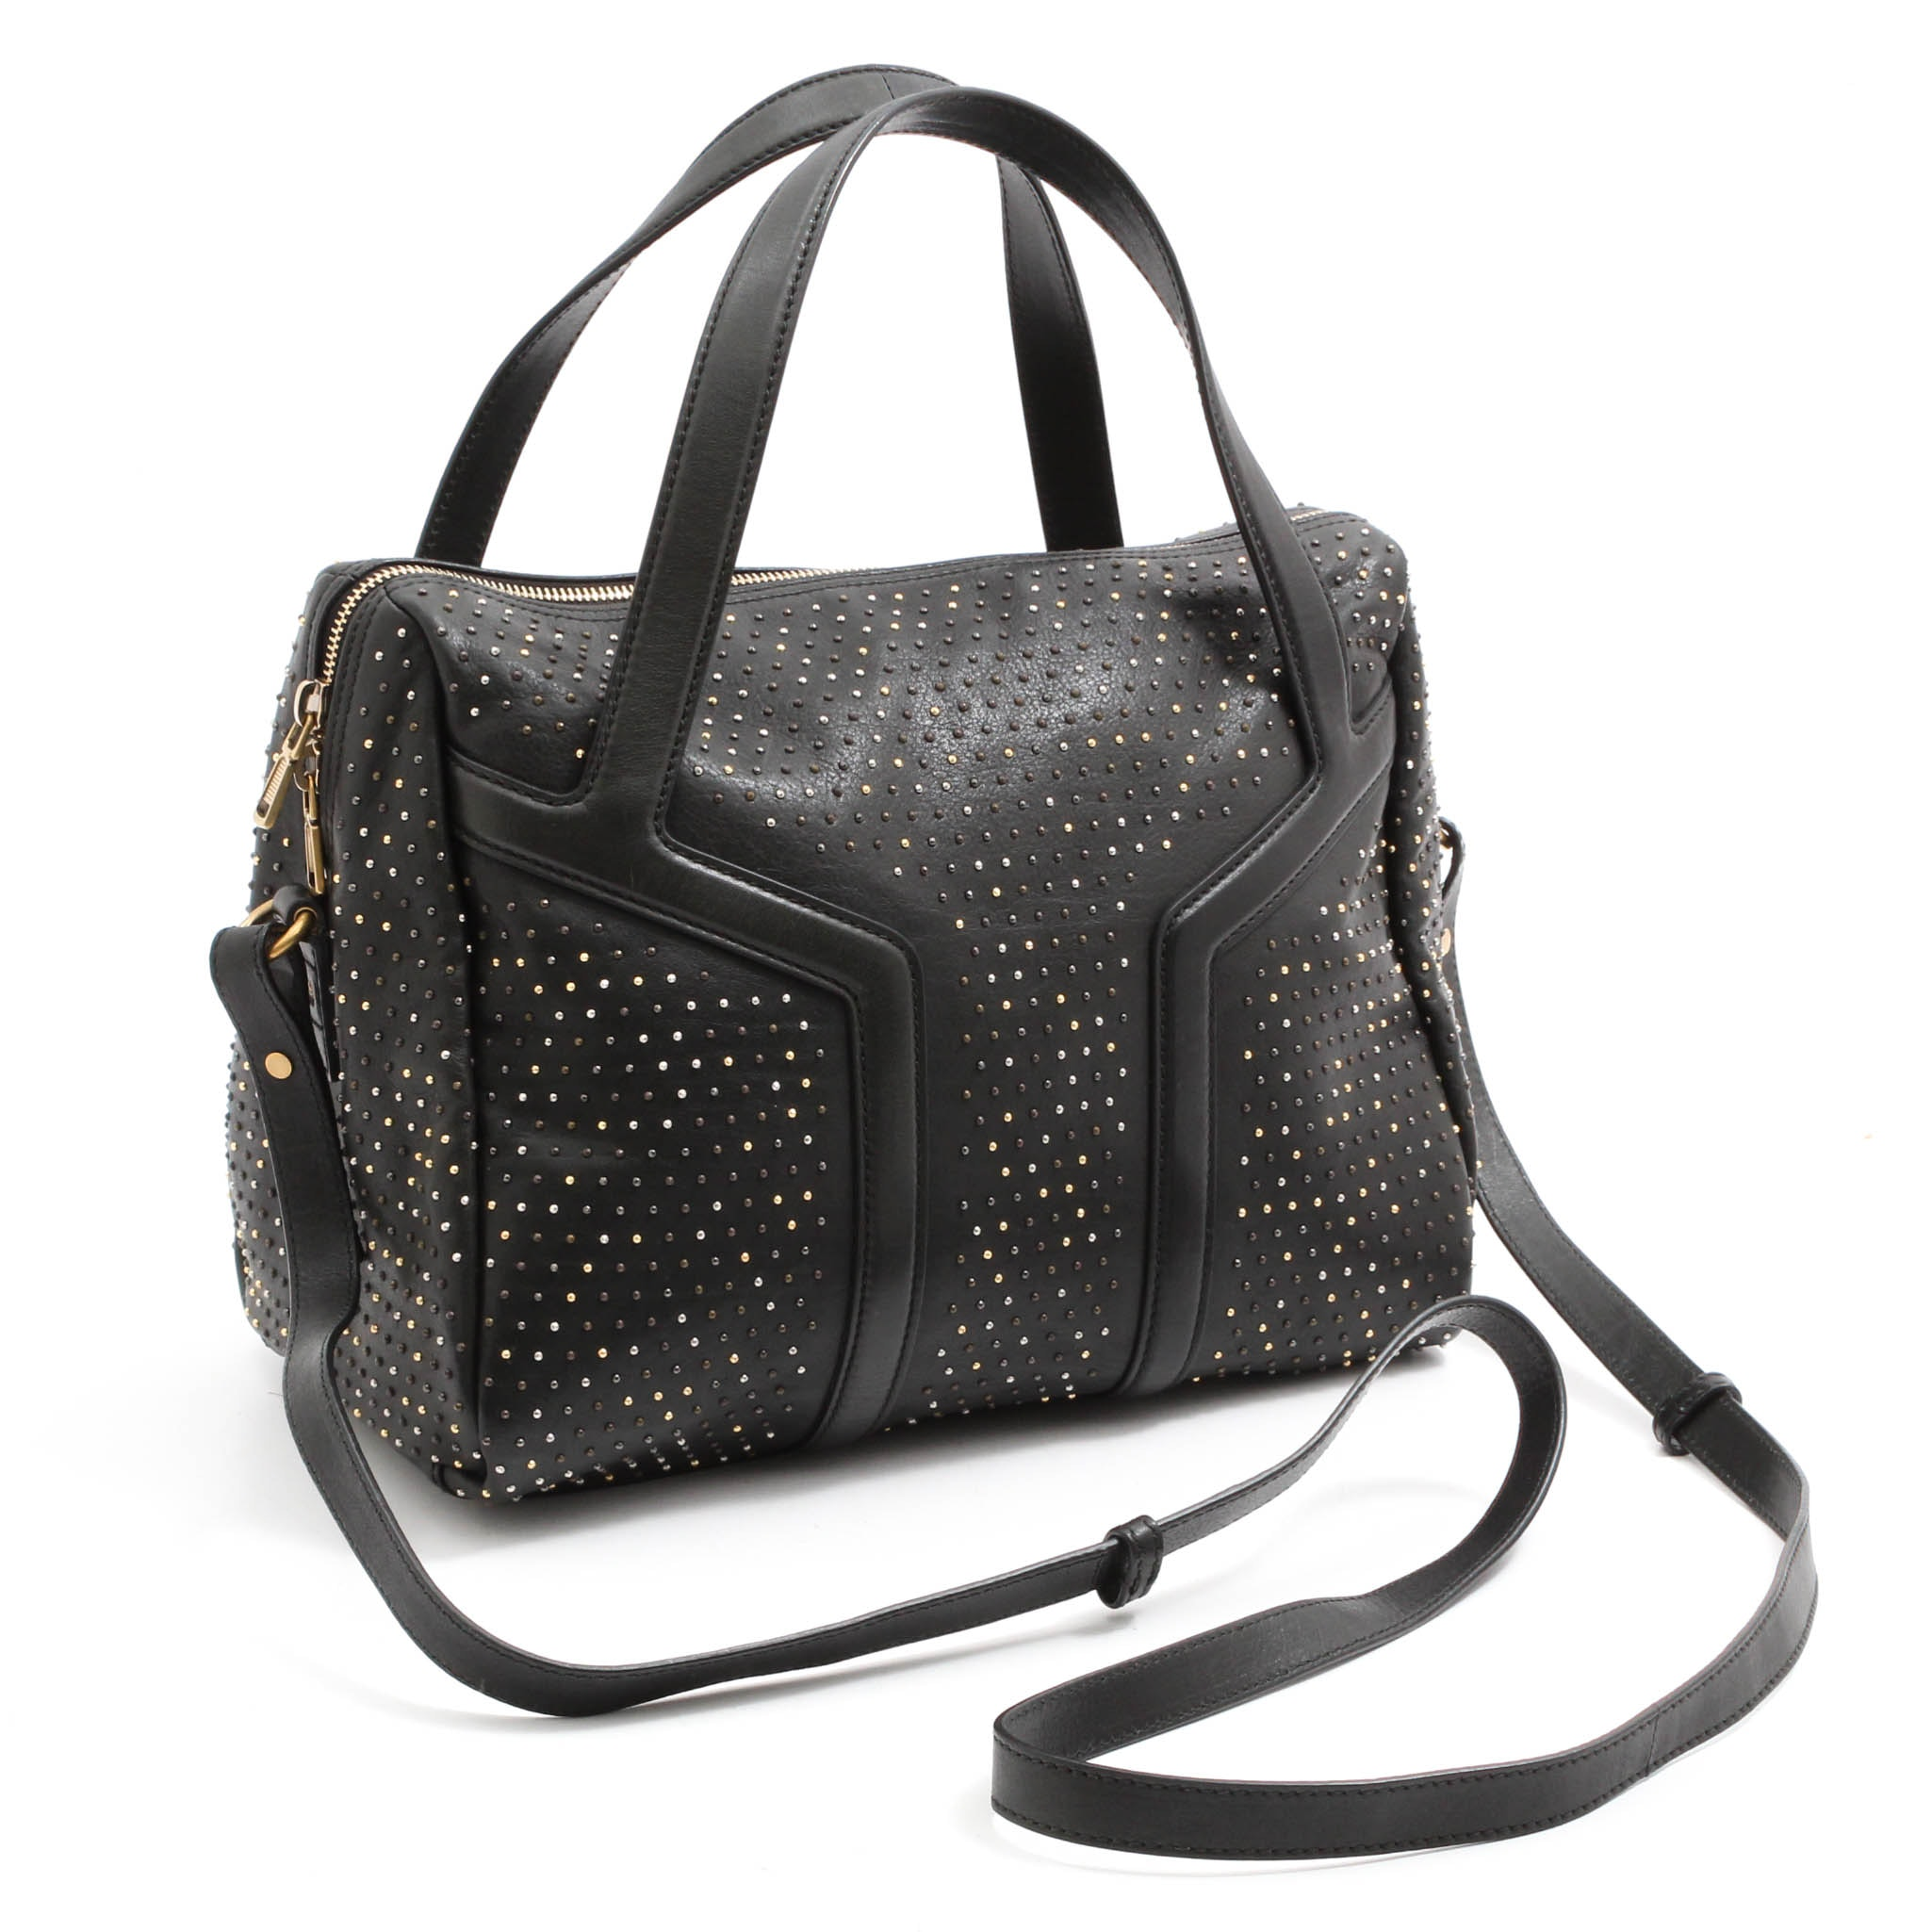 Yves Saint Laurent Studded Black Leather Two-Way Satchel